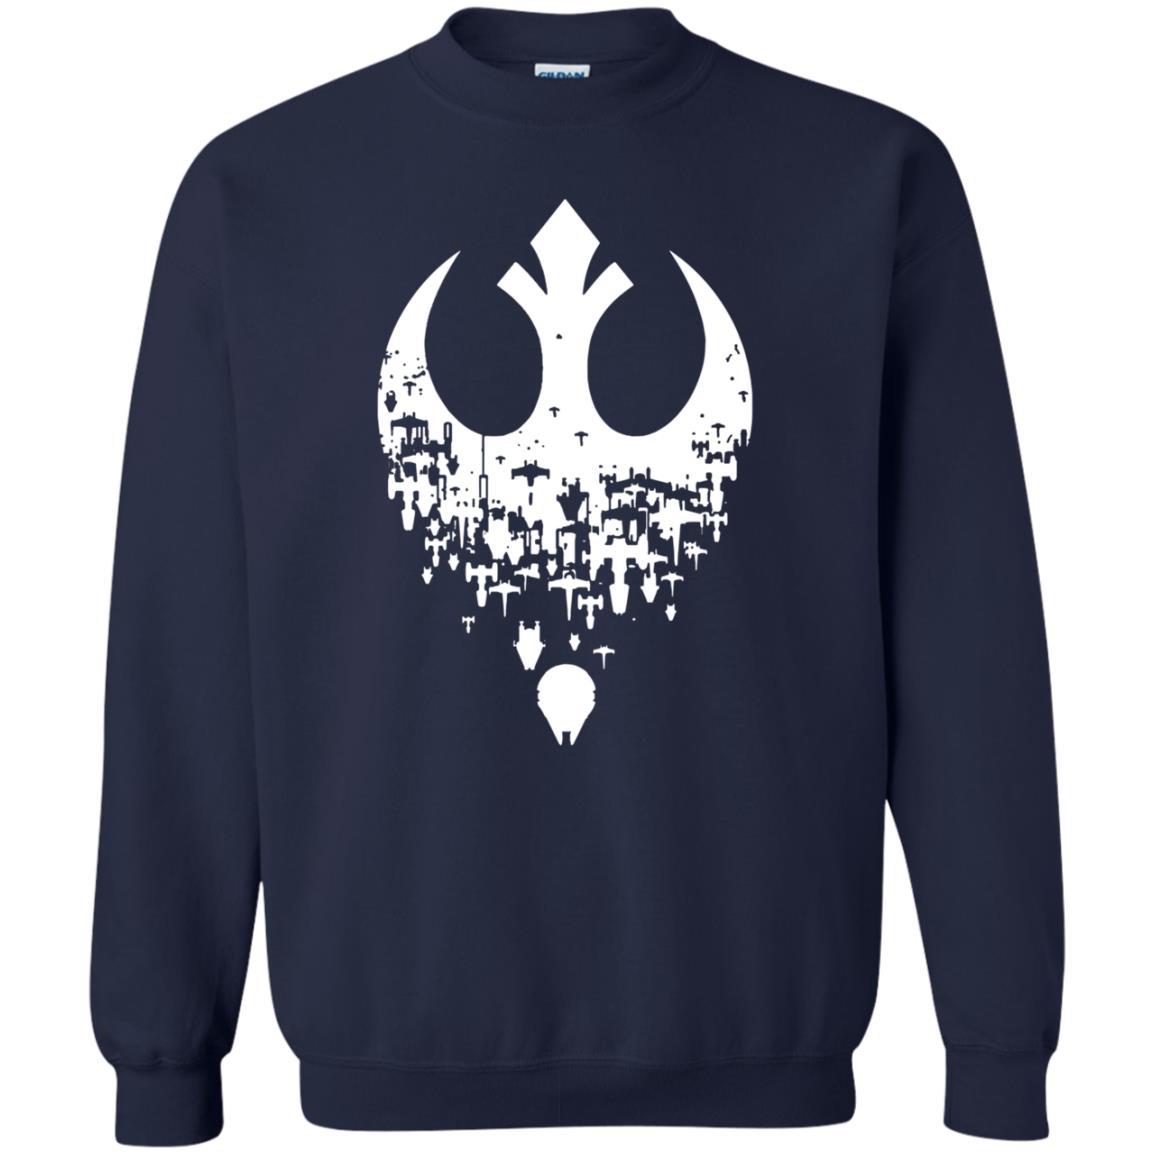 image 1506 - Star Wars Fractured Rebellion shirt, hoodie, tank